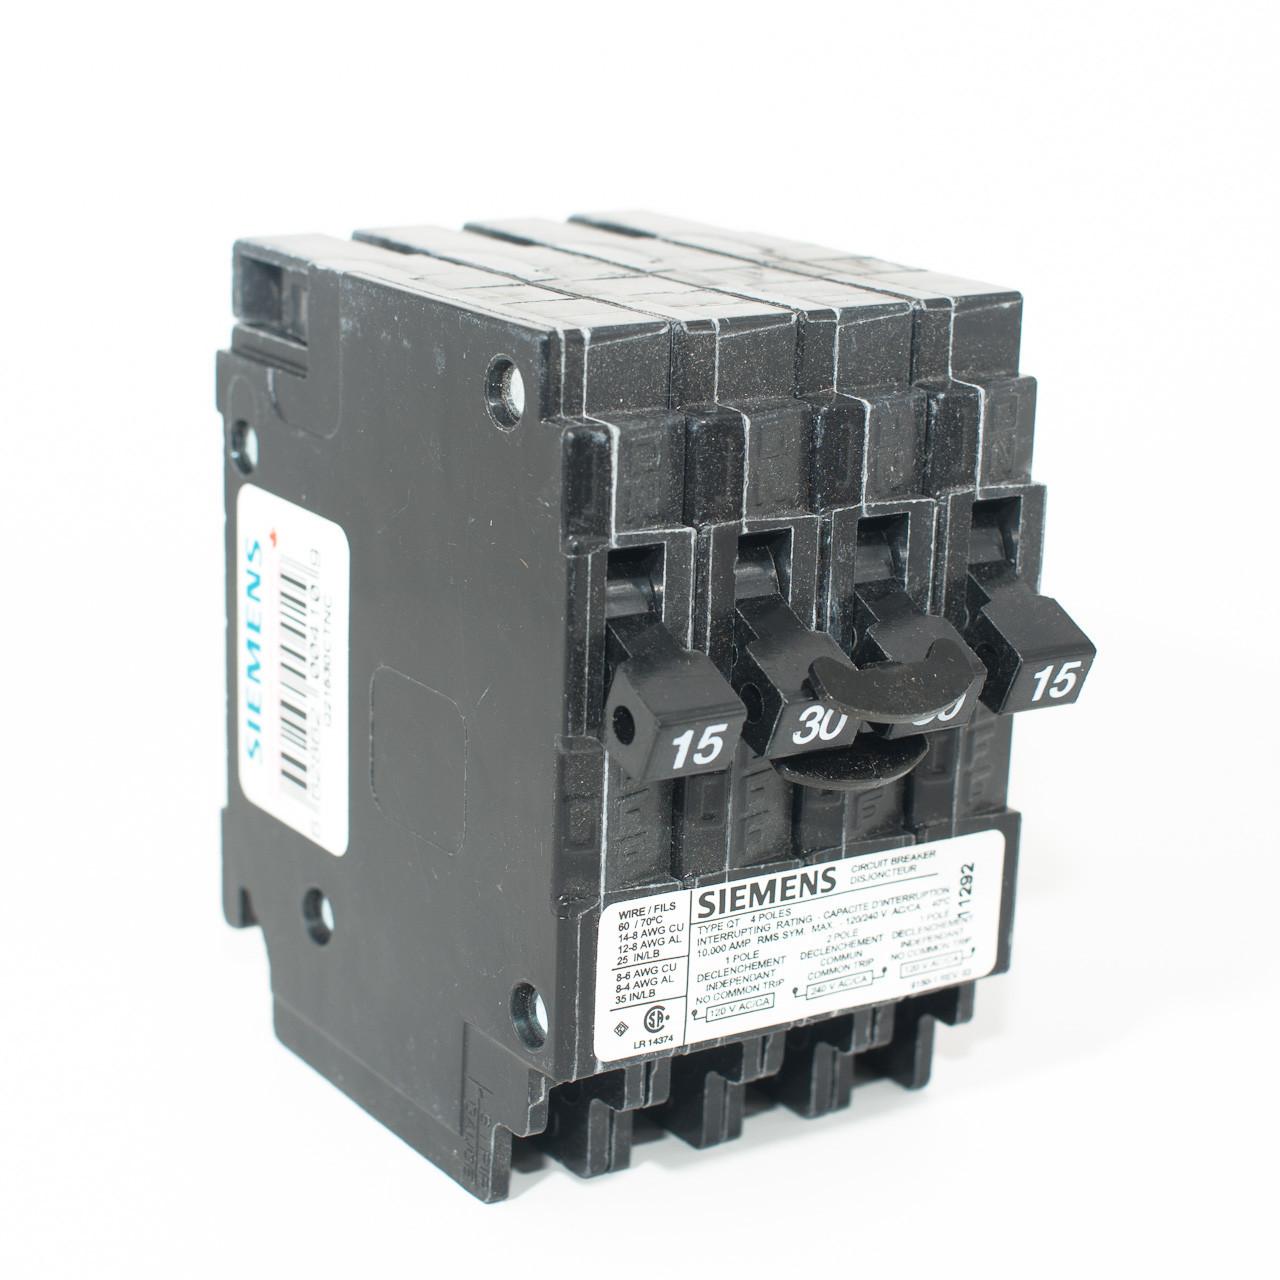 hight resolution of siemens q21530ctnc 15 2p30 15 quad push on breaker tremtech electrical systems inc